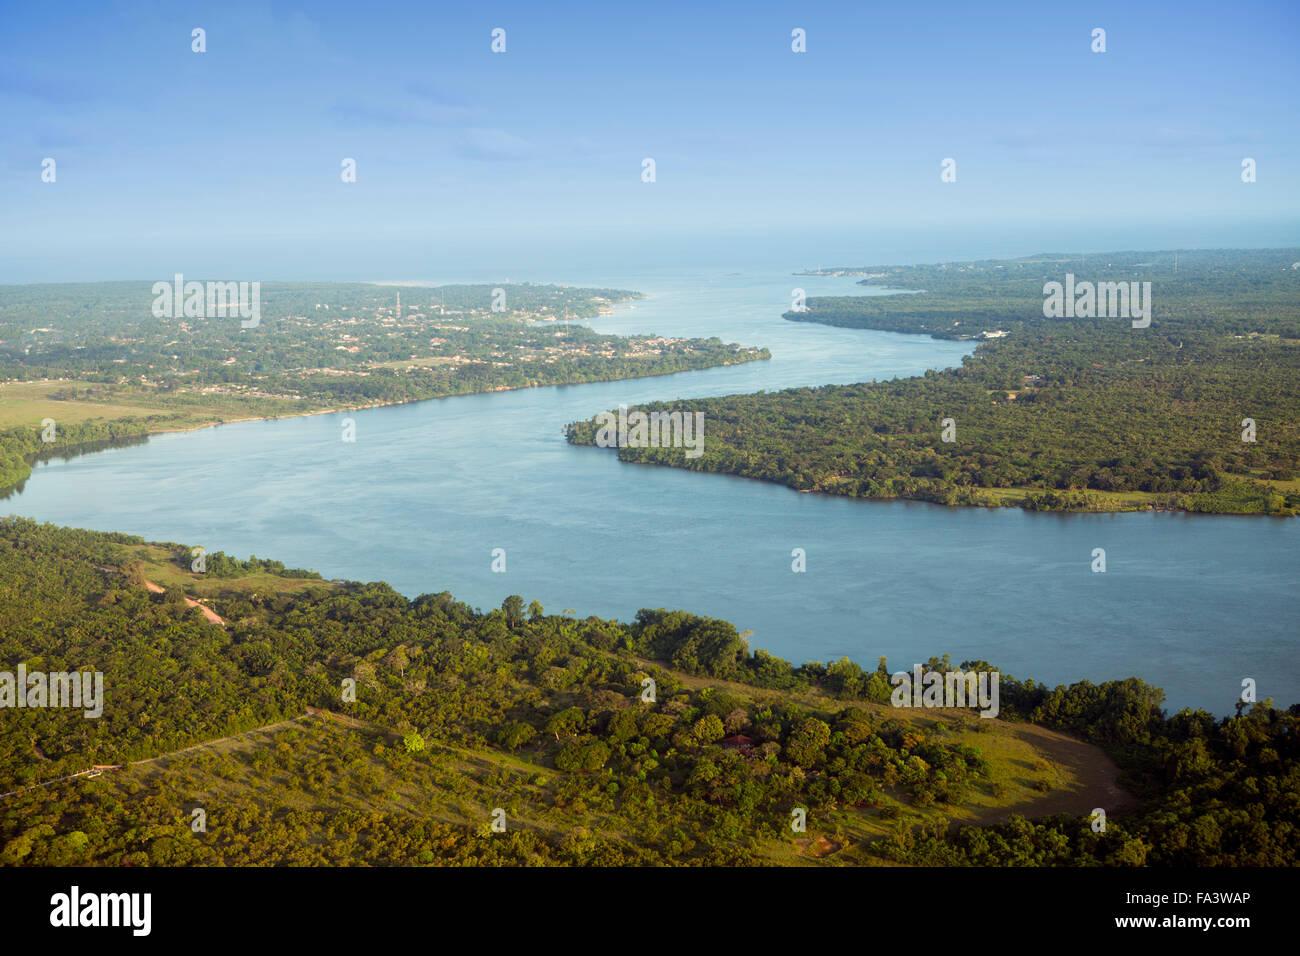 Soure village and the mouth of the Paracauari river on Marajo island, Brazilian Amazon, Amazon basin - Stock Image